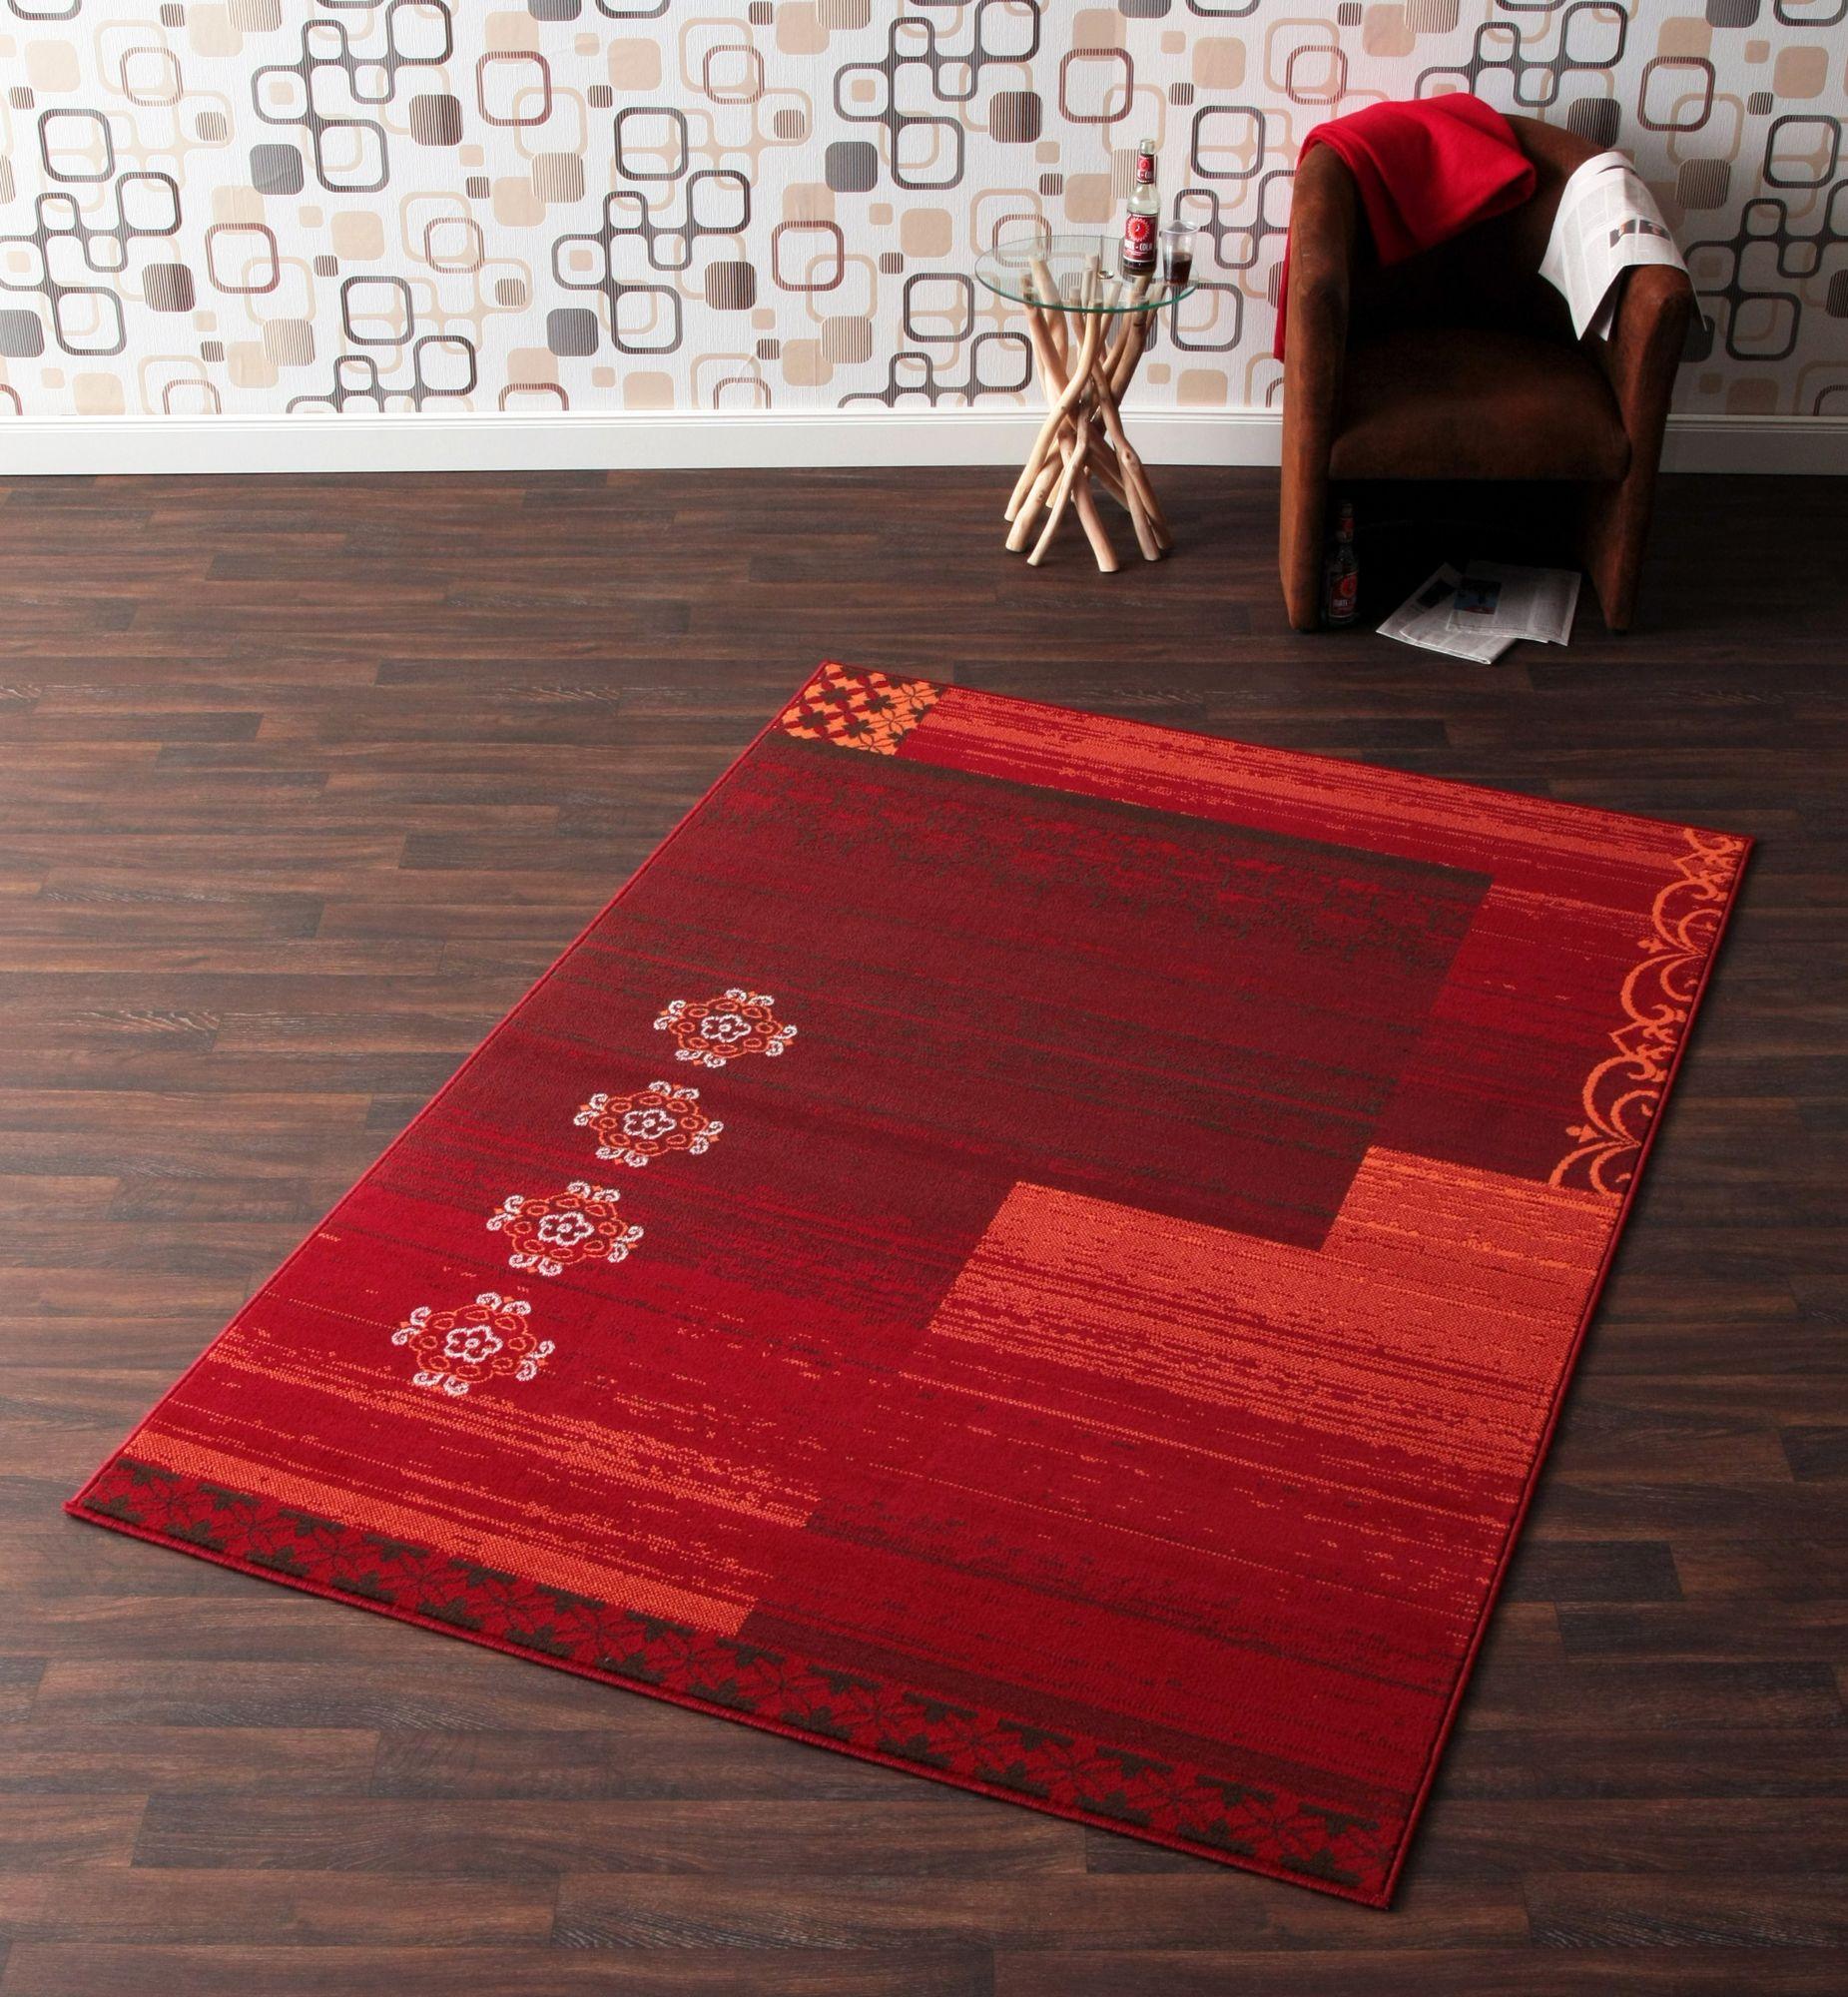 teppich hanse home emblem schwab versand moderne teppiche. Black Bedroom Furniture Sets. Home Design Ideas